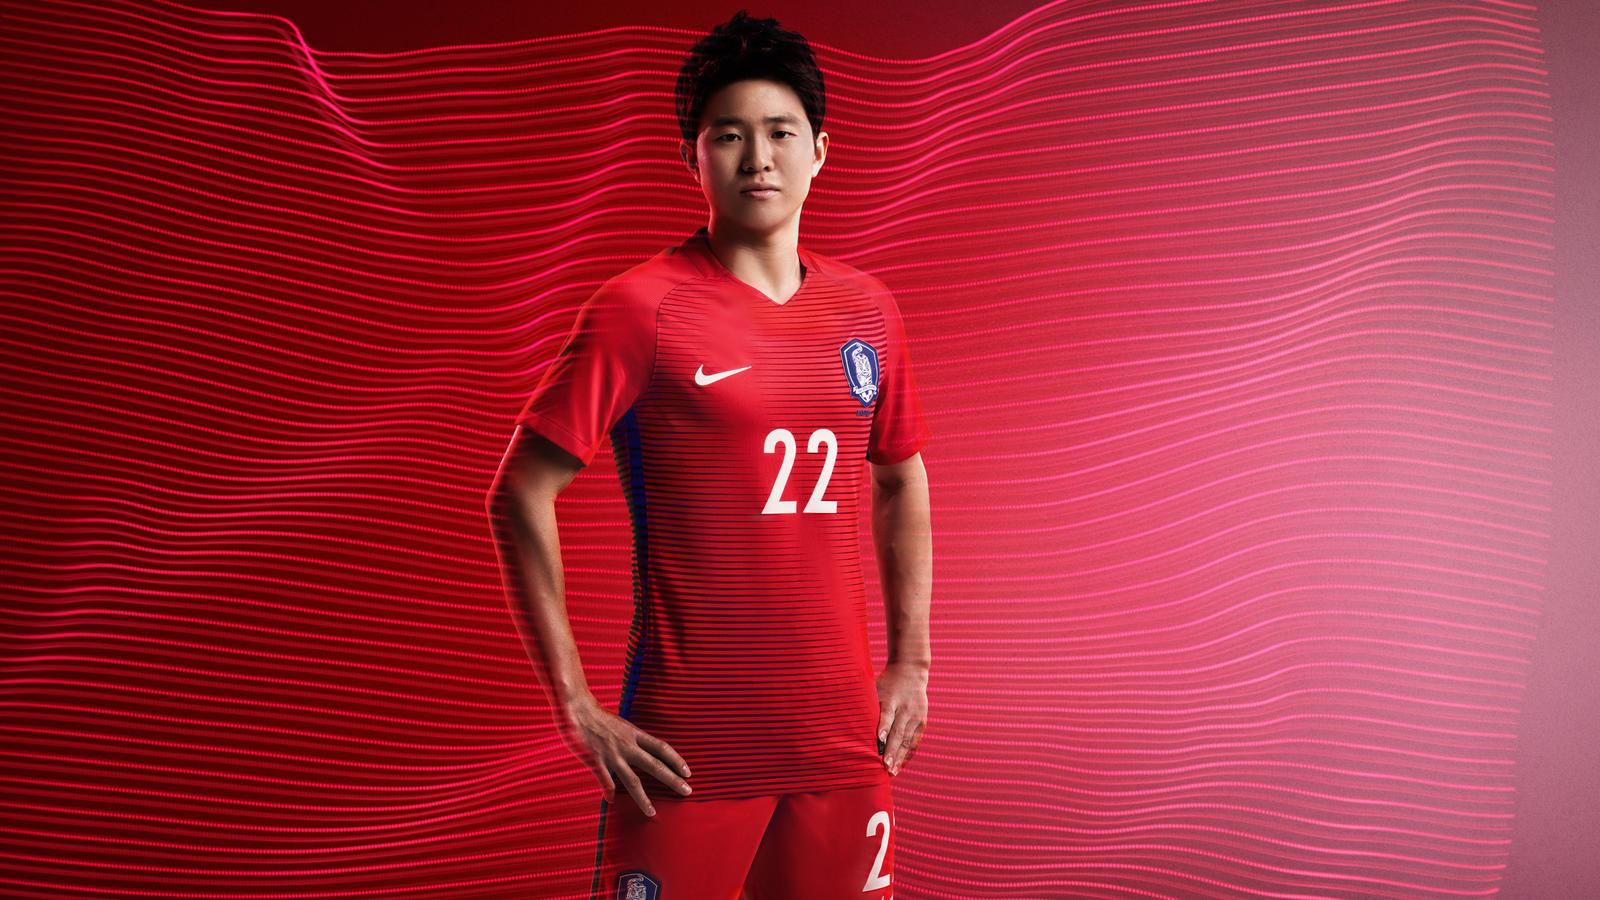 kwon chang hoon in south korea 2016 national home kit